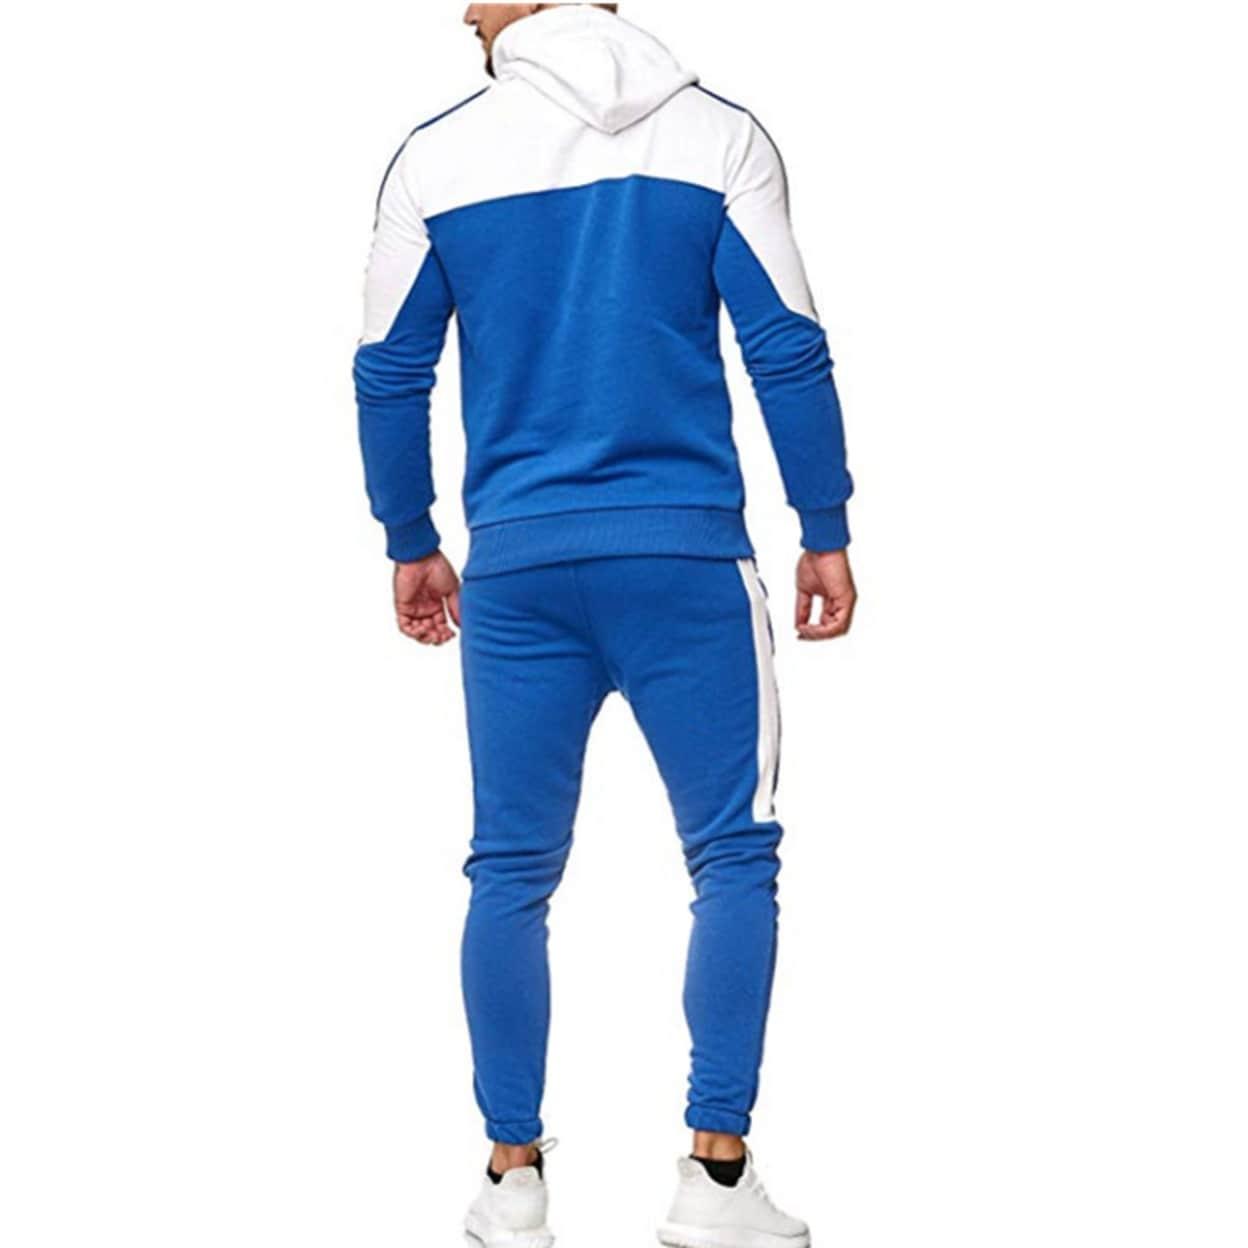 Love My Fashions/® Mens Tracksuit Set Kids Contrast Cord Fleece Hoodie Top Bottoms Jogging Zip Joggers Gym Causal Exercise Running Sport Sweat Suit Pants Plus Size S M L XL XXL